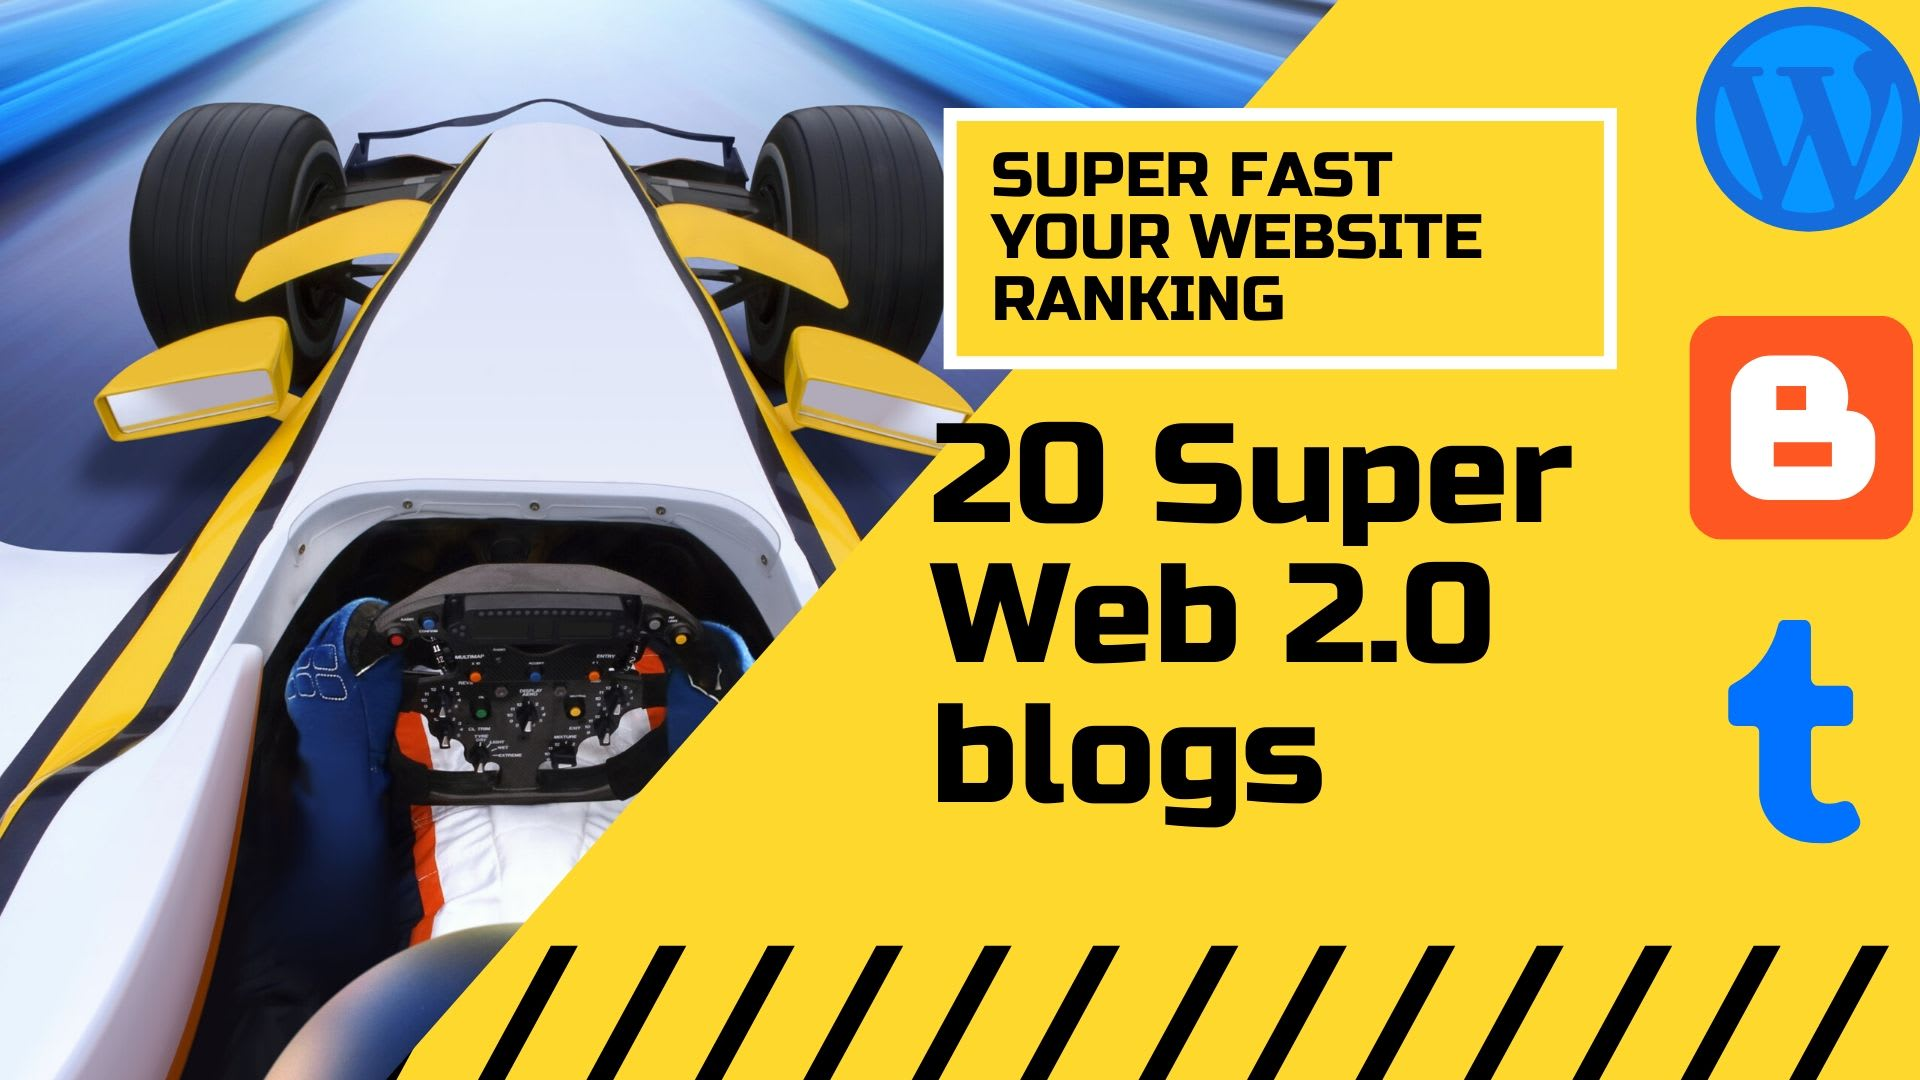 create manually 20 fully optimized web 2.0 blogs with 10 Social backlinks